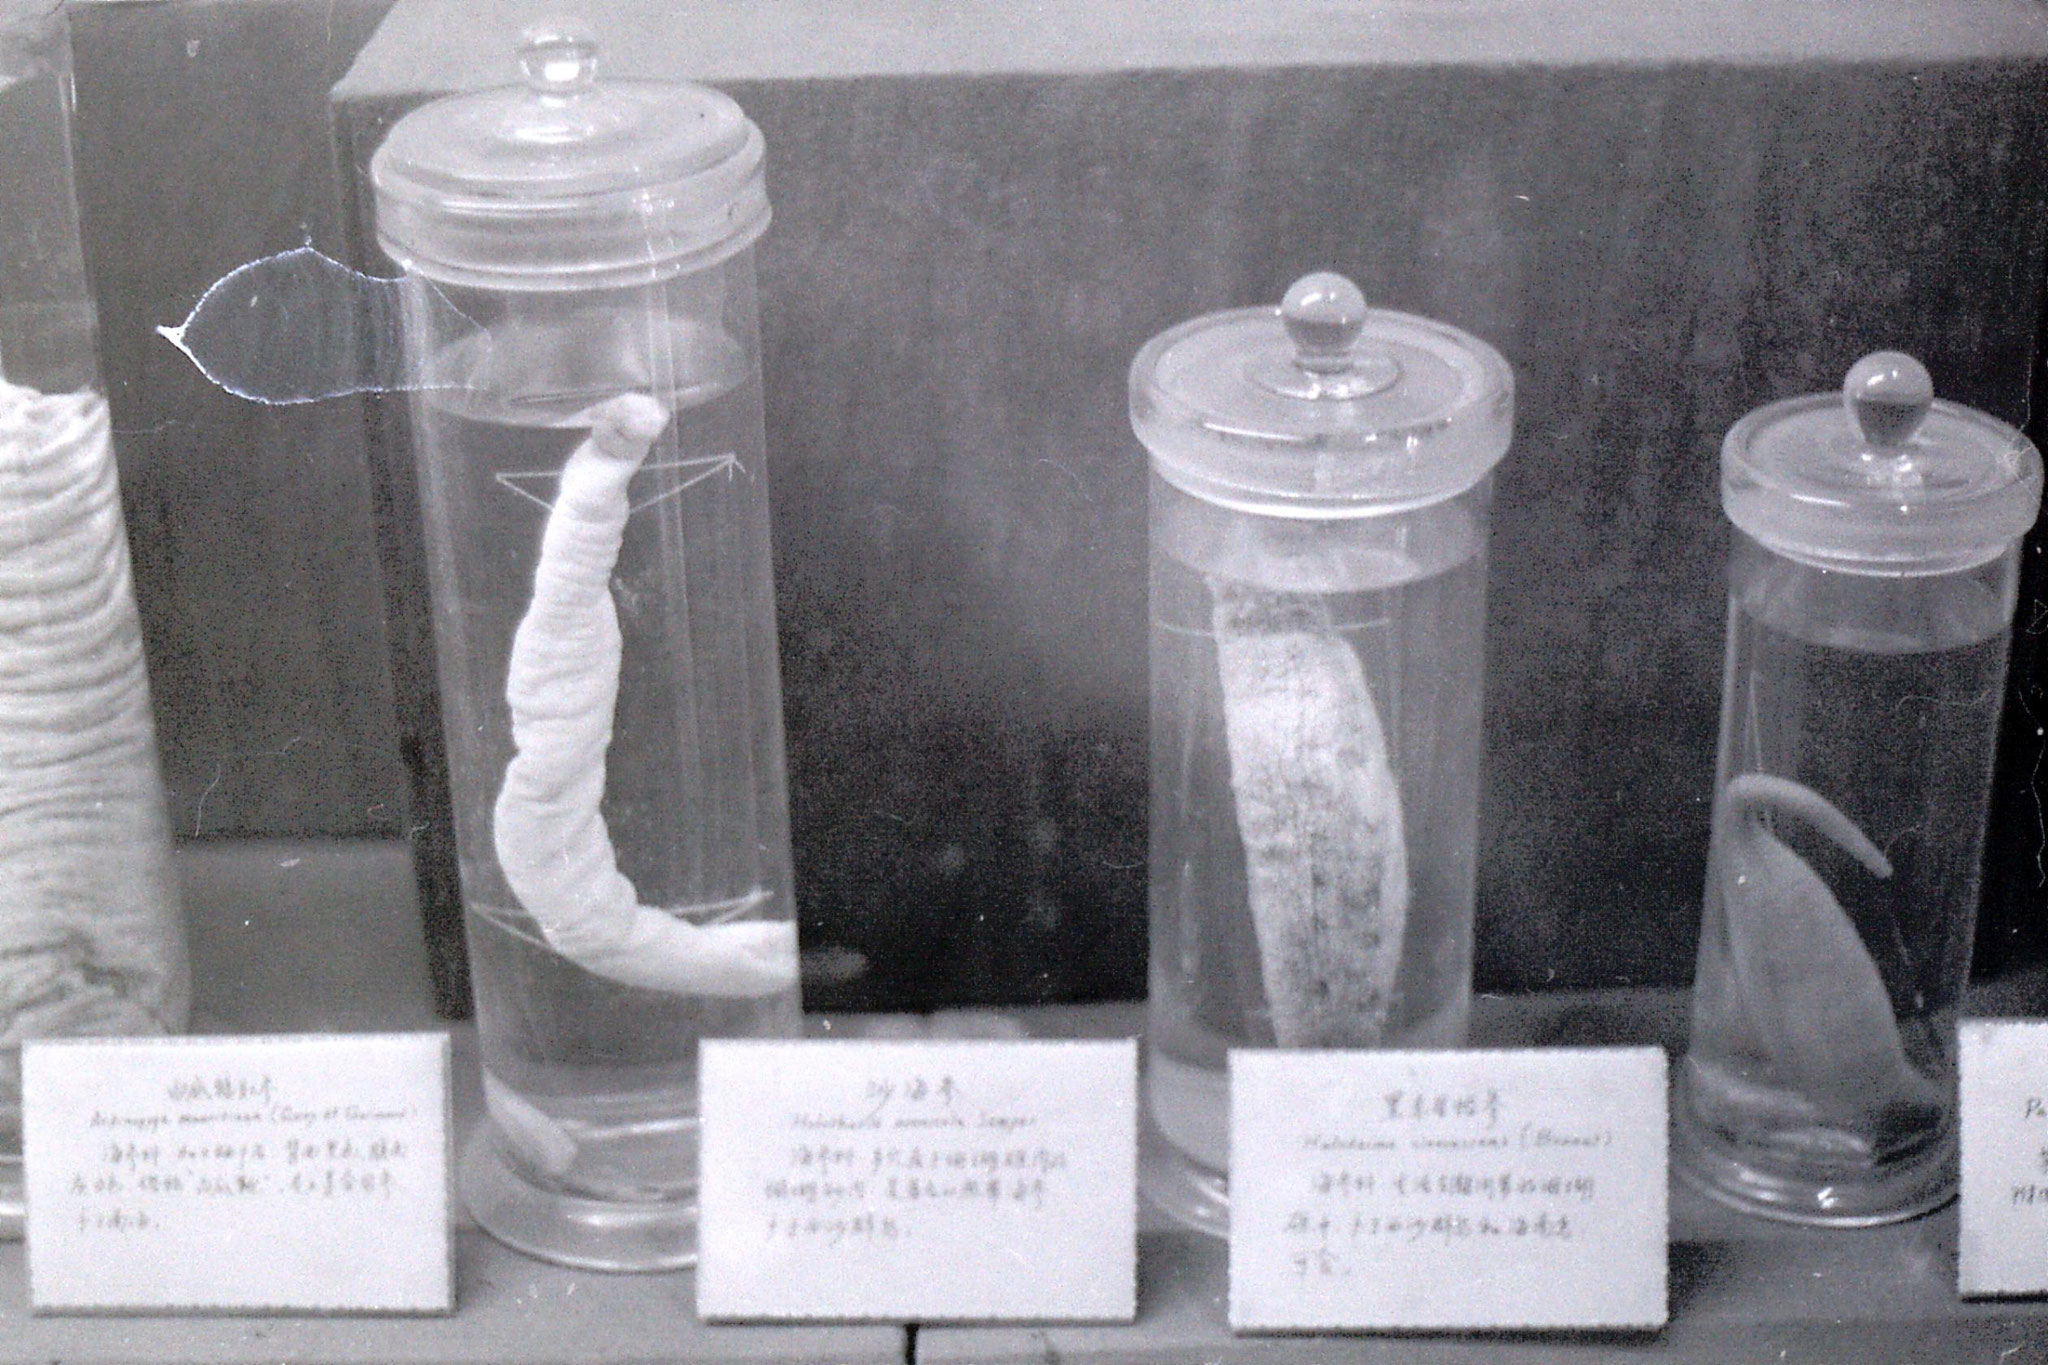 14/2/1989: 29: Qingdao Marine Museum, sea cucumbers